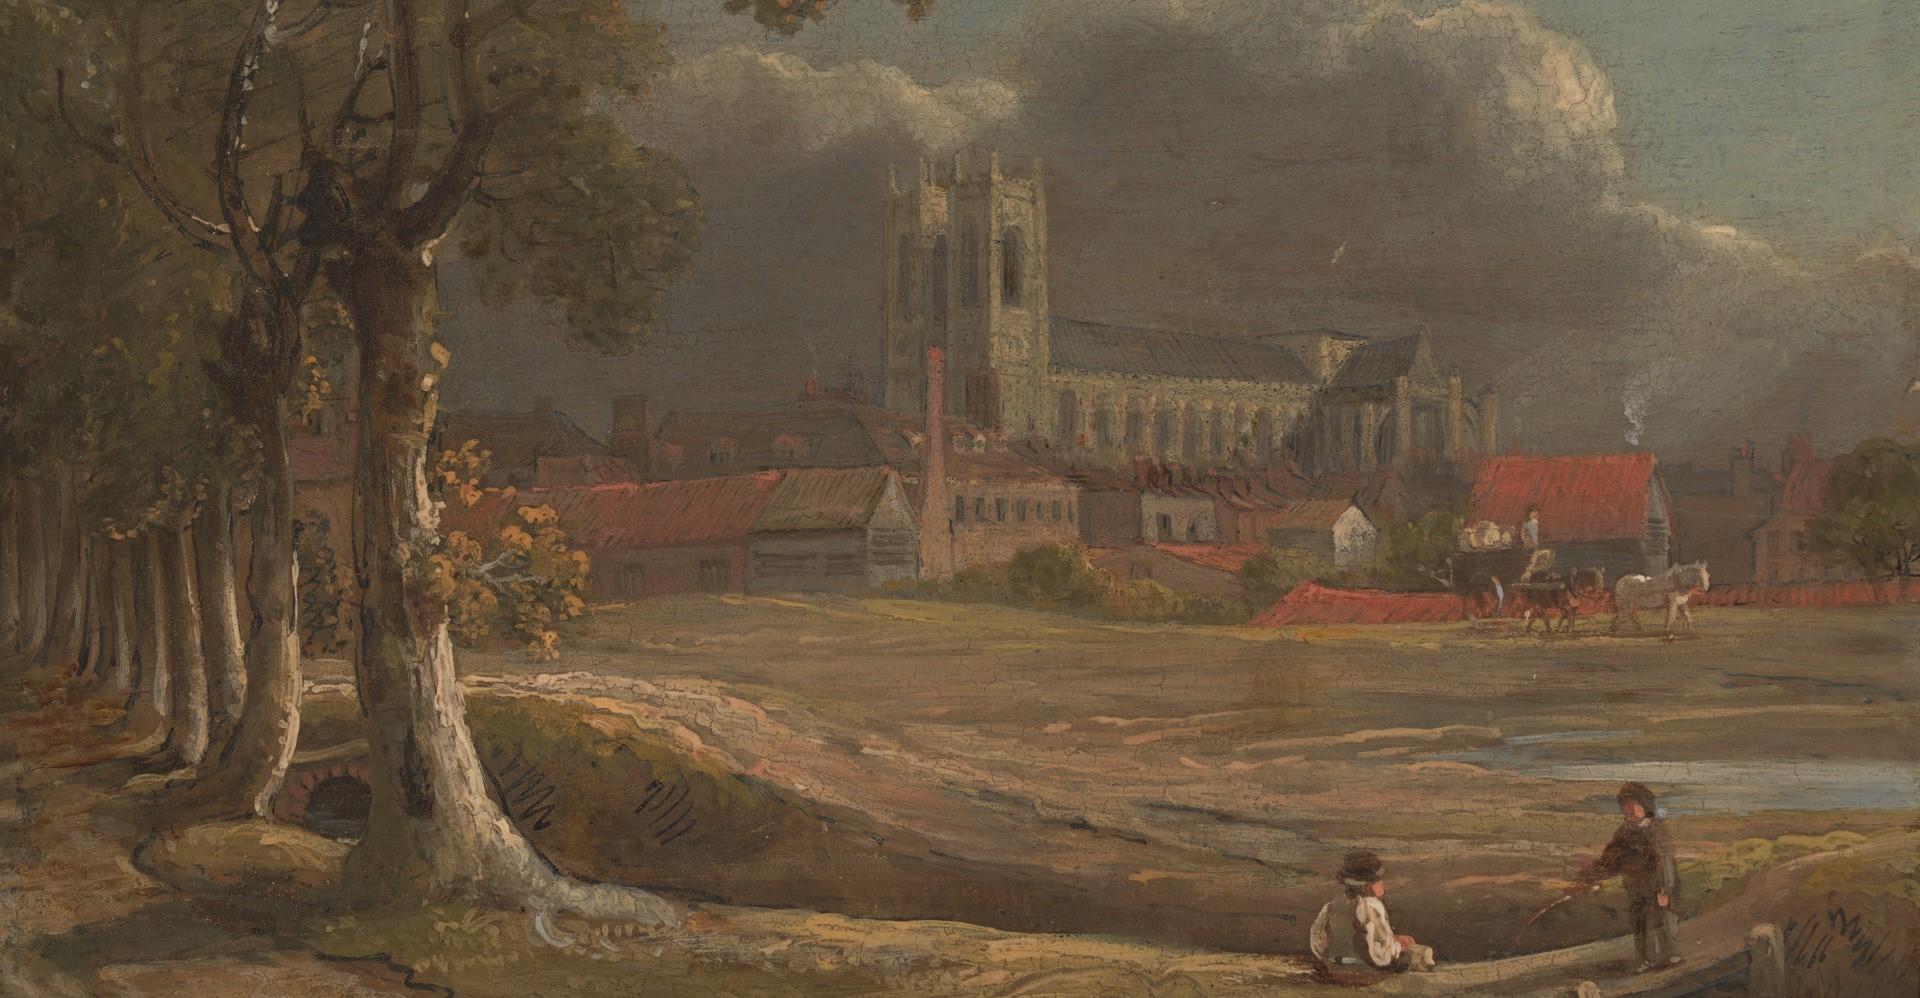 Gruesome Murder at the Grey Coat School in 1773